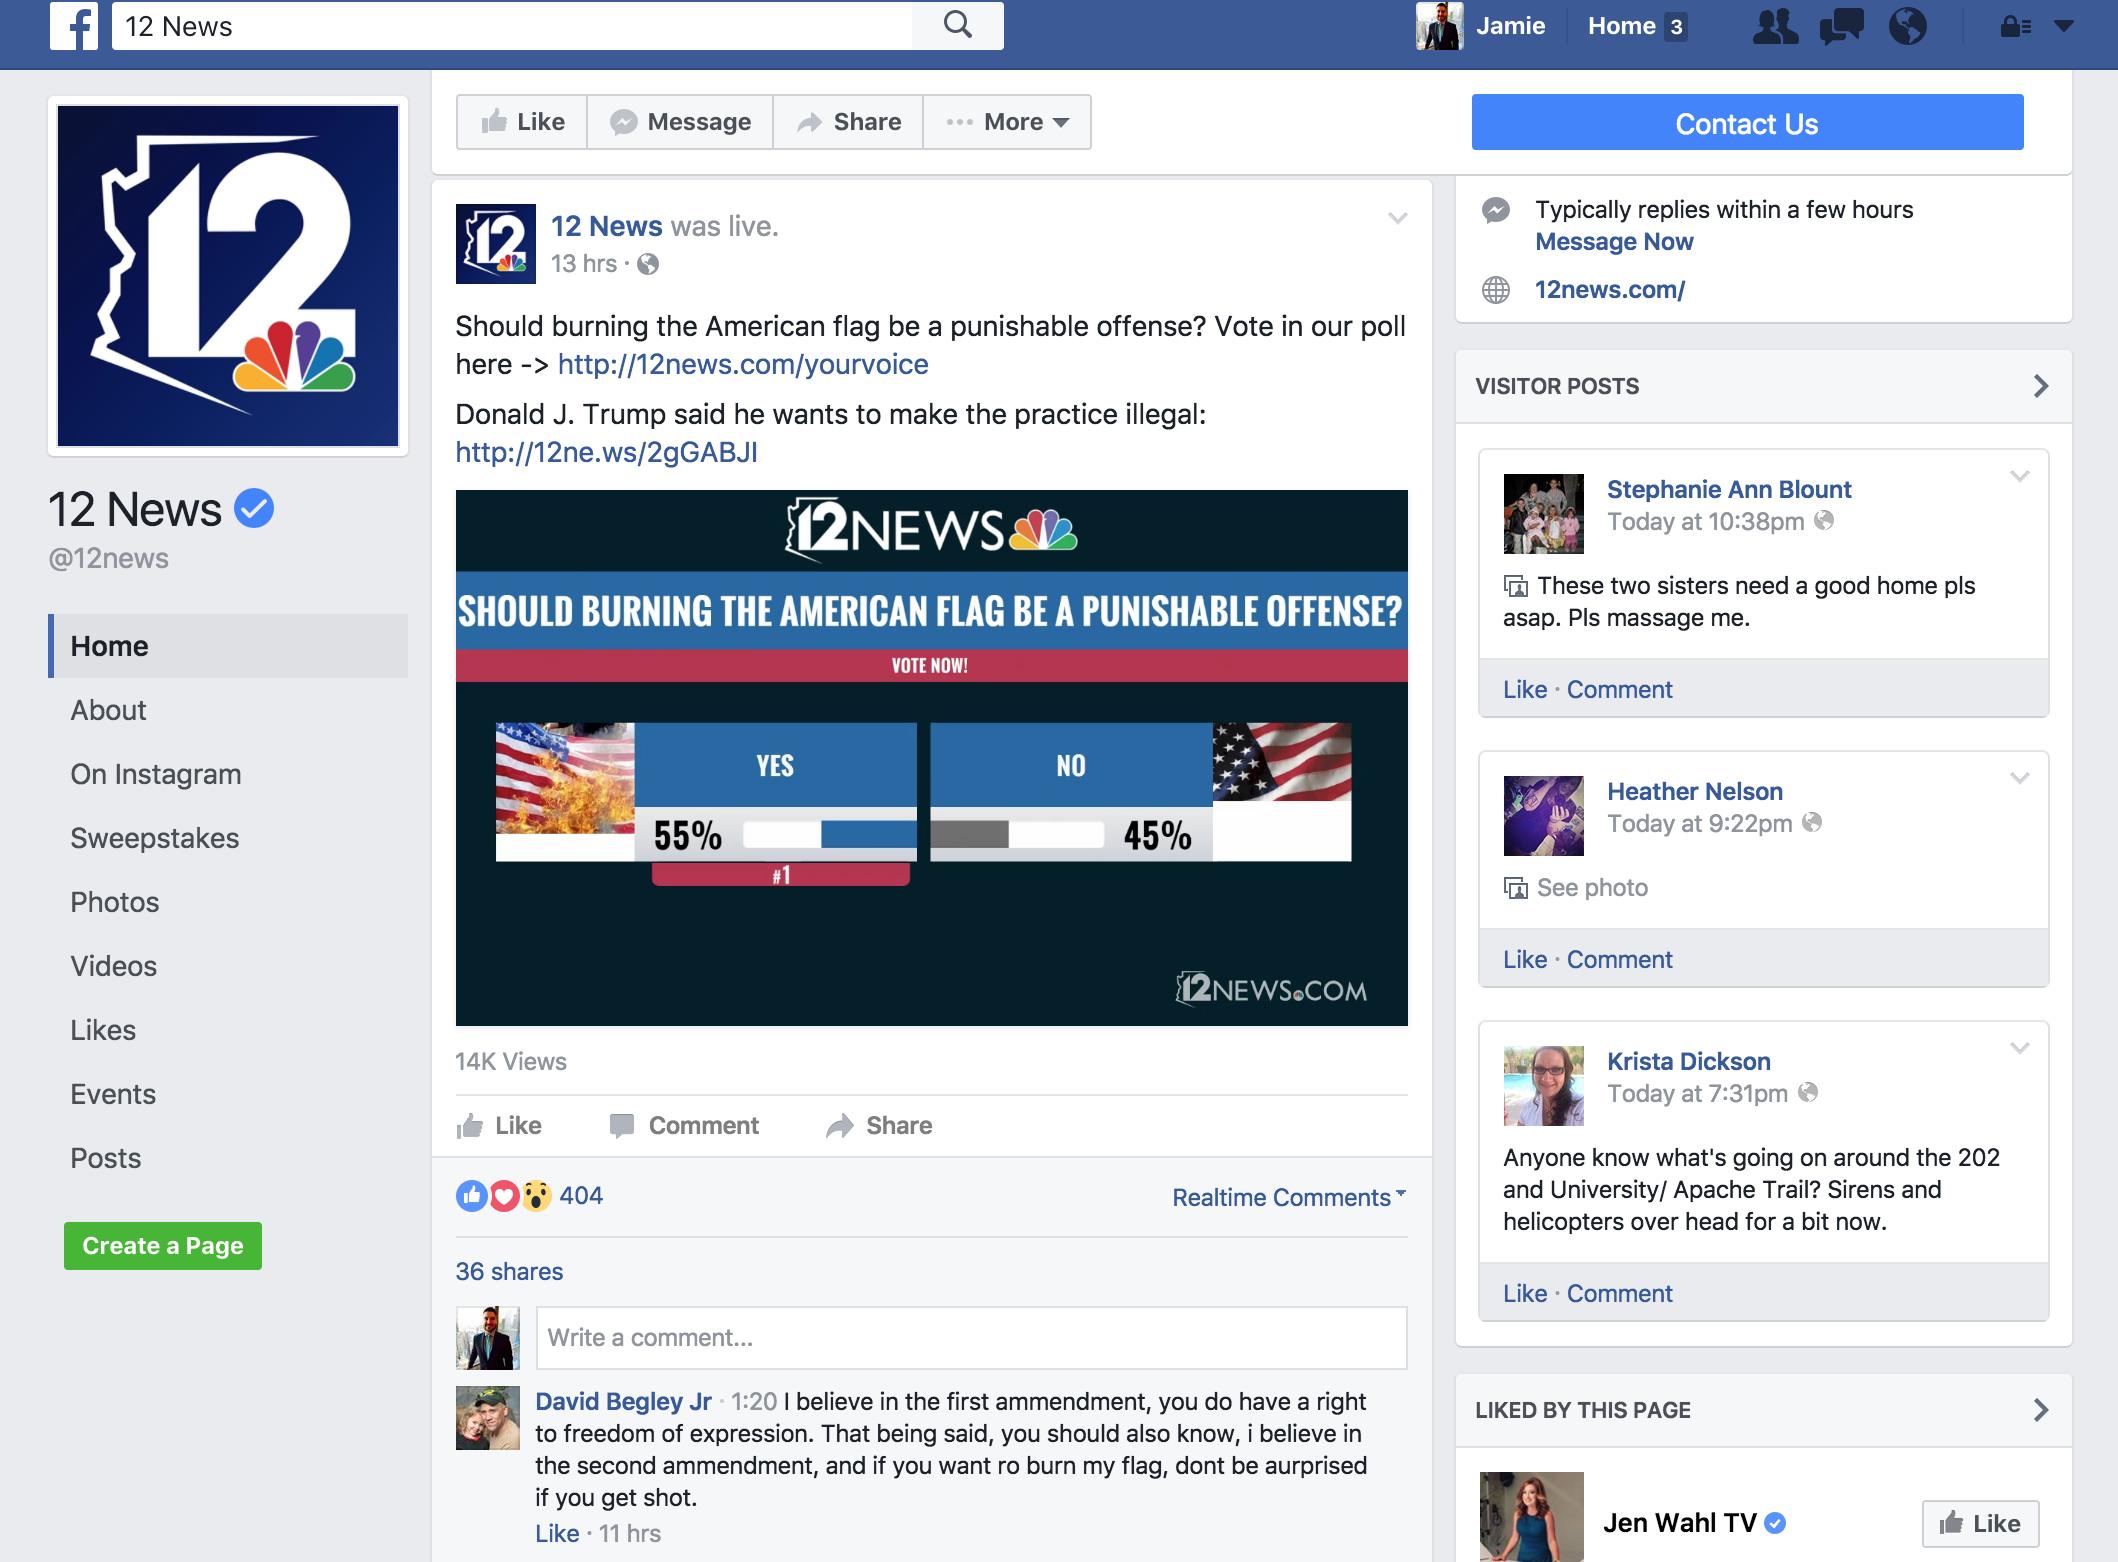 Phoenix's KPNX/12News runs a long-term poll on Facebook Live.